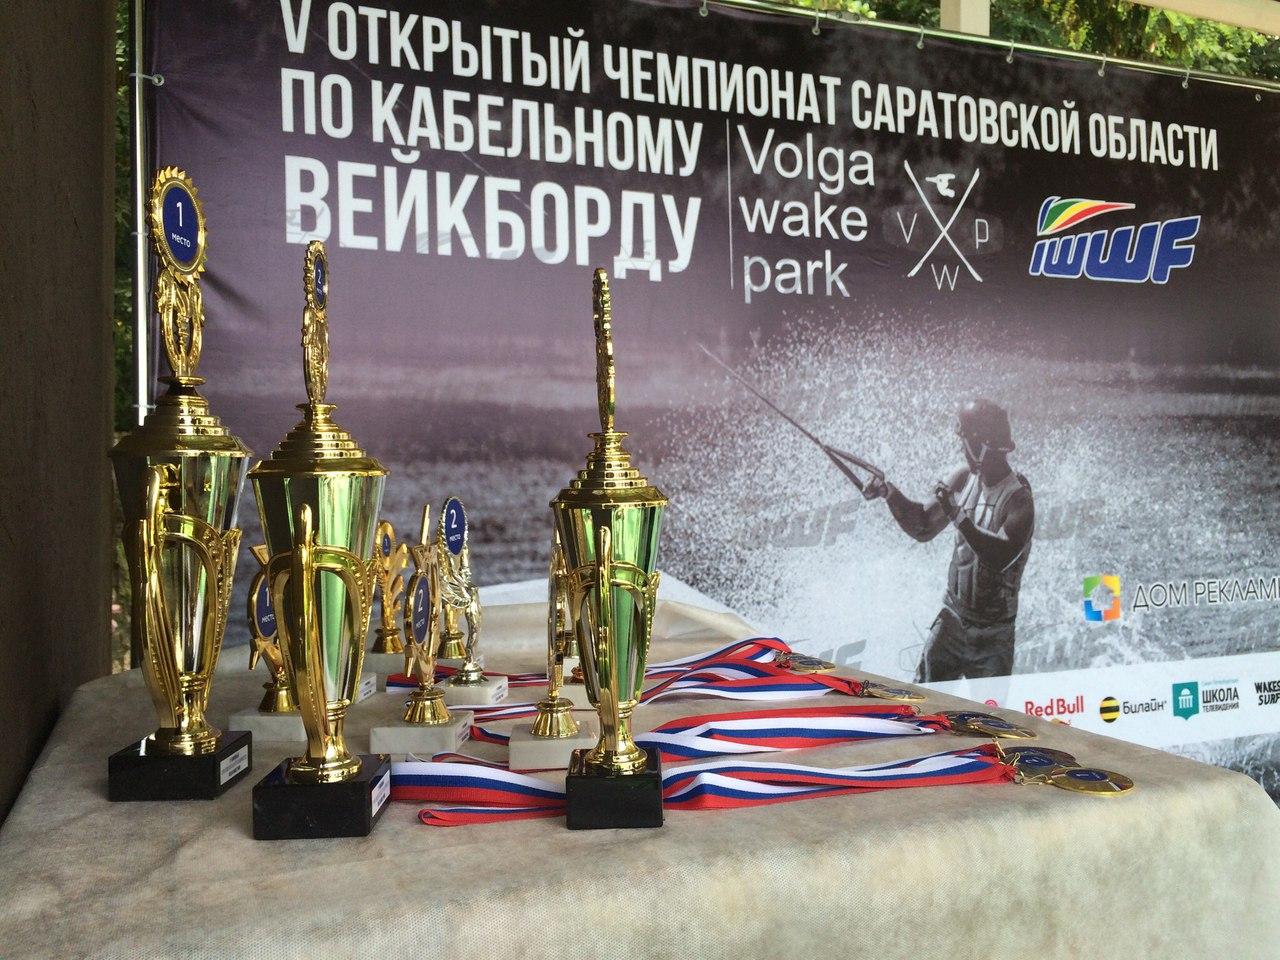 Volga Wake Park - кабельный вейк-парк